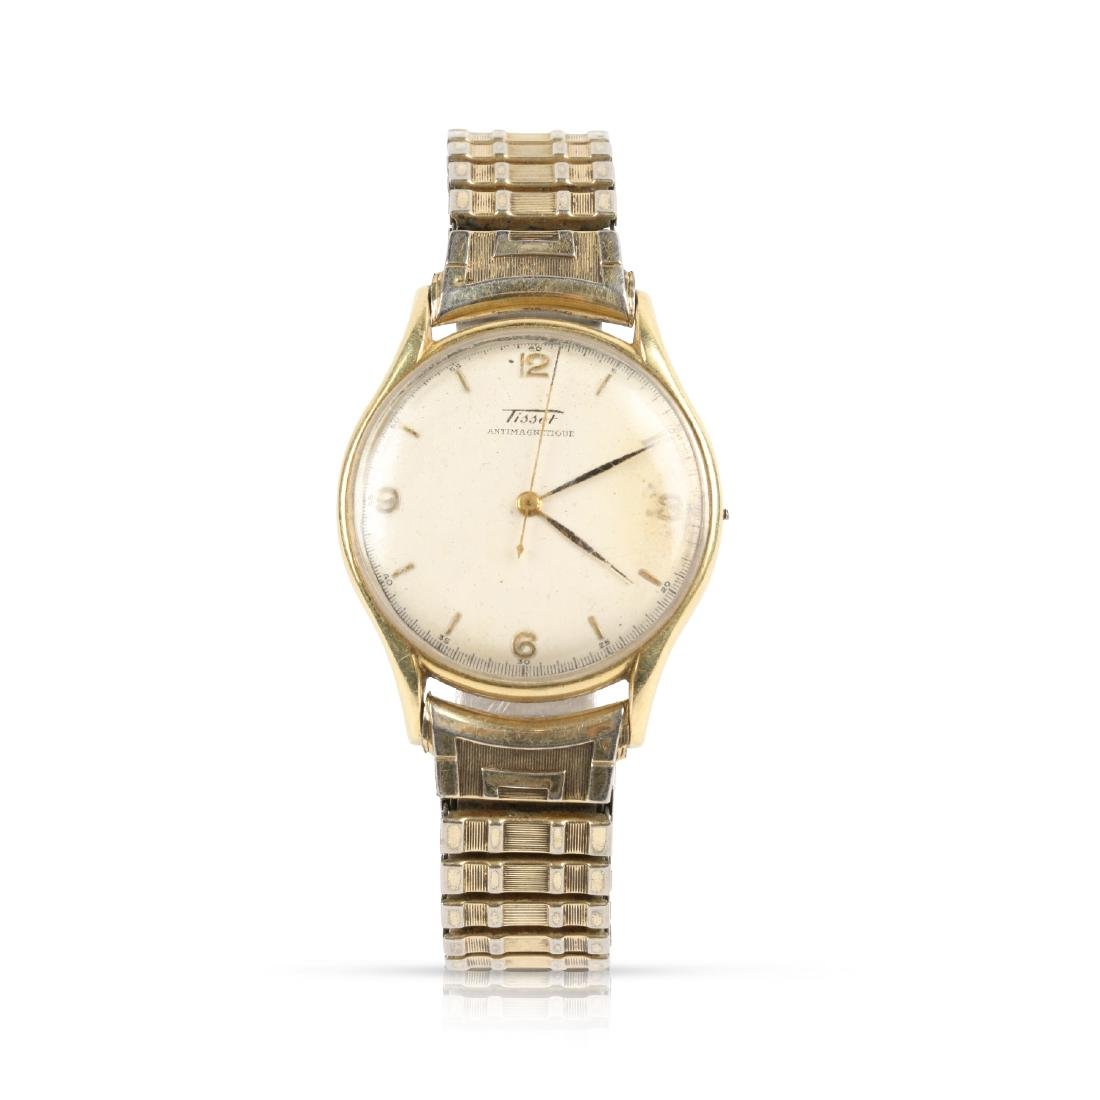 Tissot, Antimagnetique Wristwatch